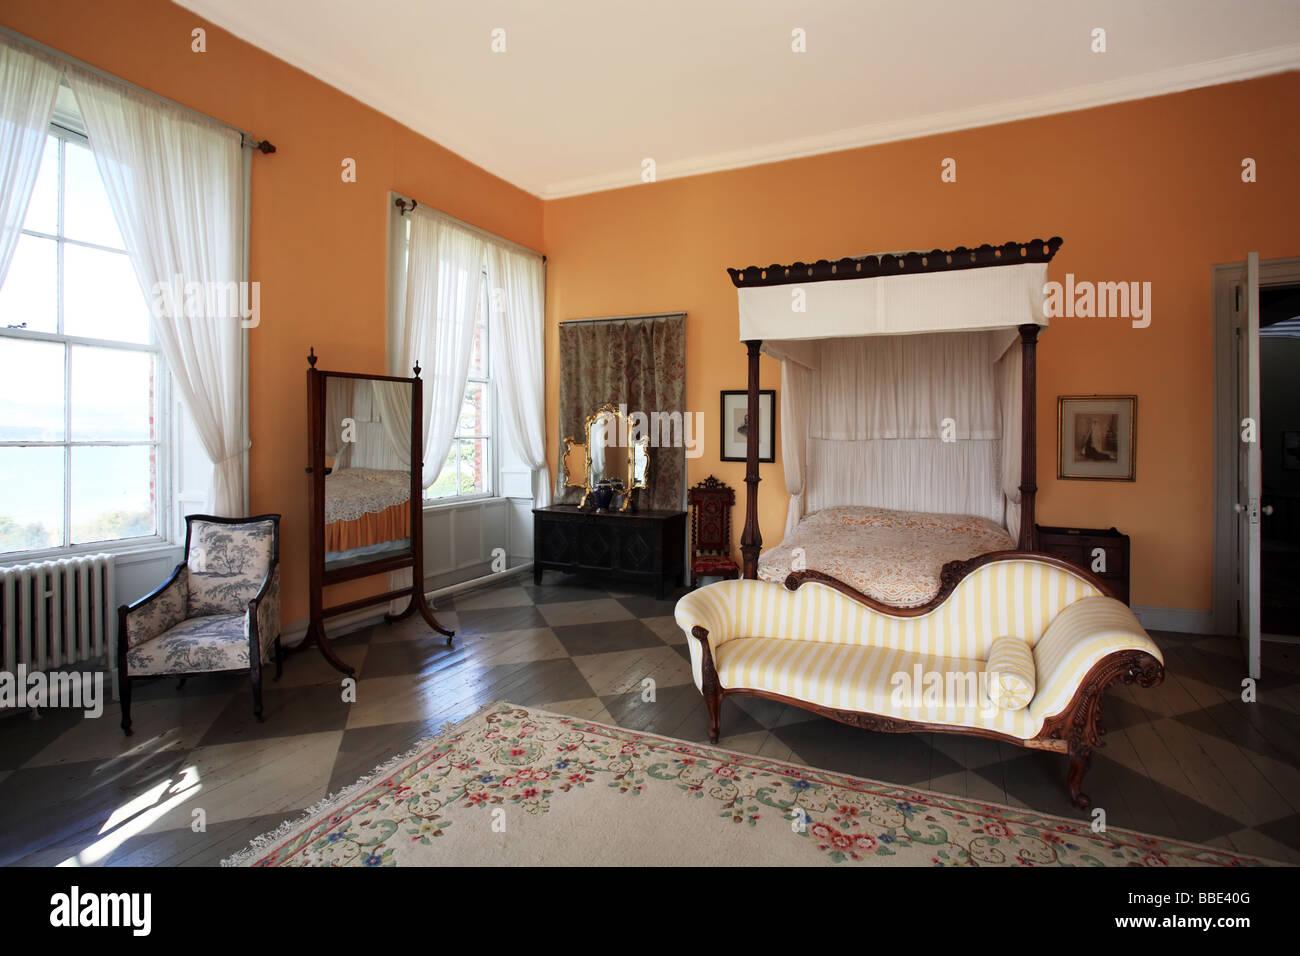 bantry house interior west cork ireland stock photo, royalty free